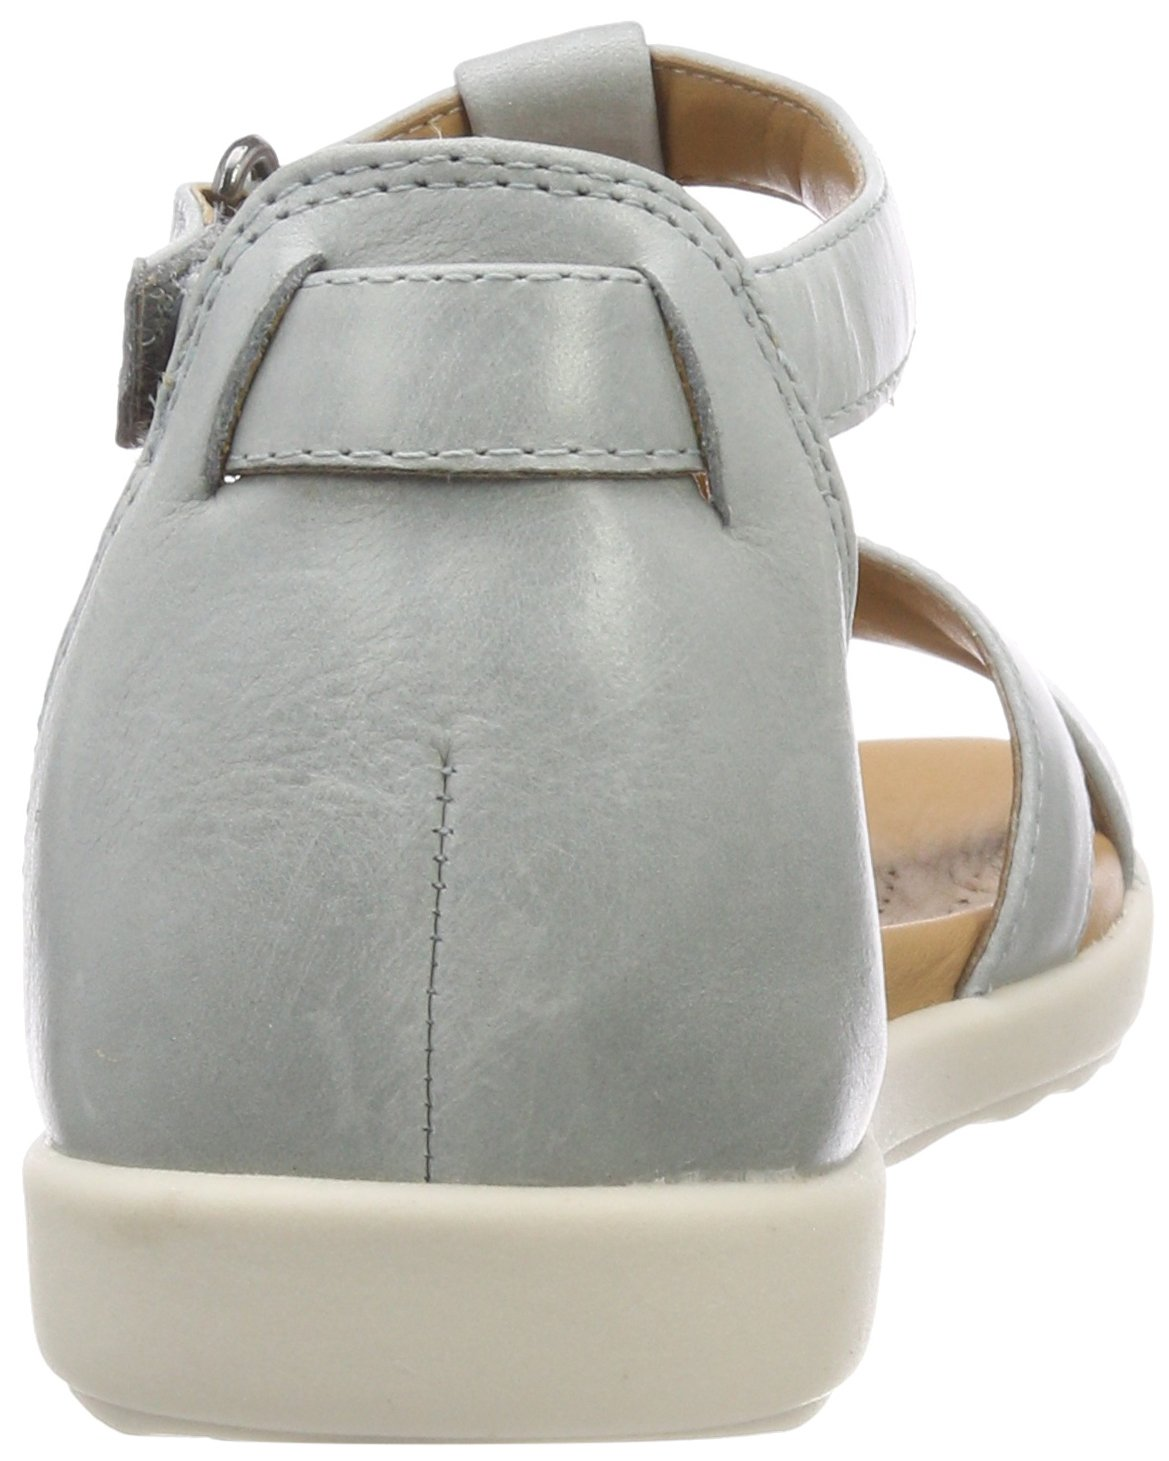 Clarks Damen Sandalen, Un Reisel Mara T-Spangen Sandalen, Damen Blau (Blau Grau) 4f567a